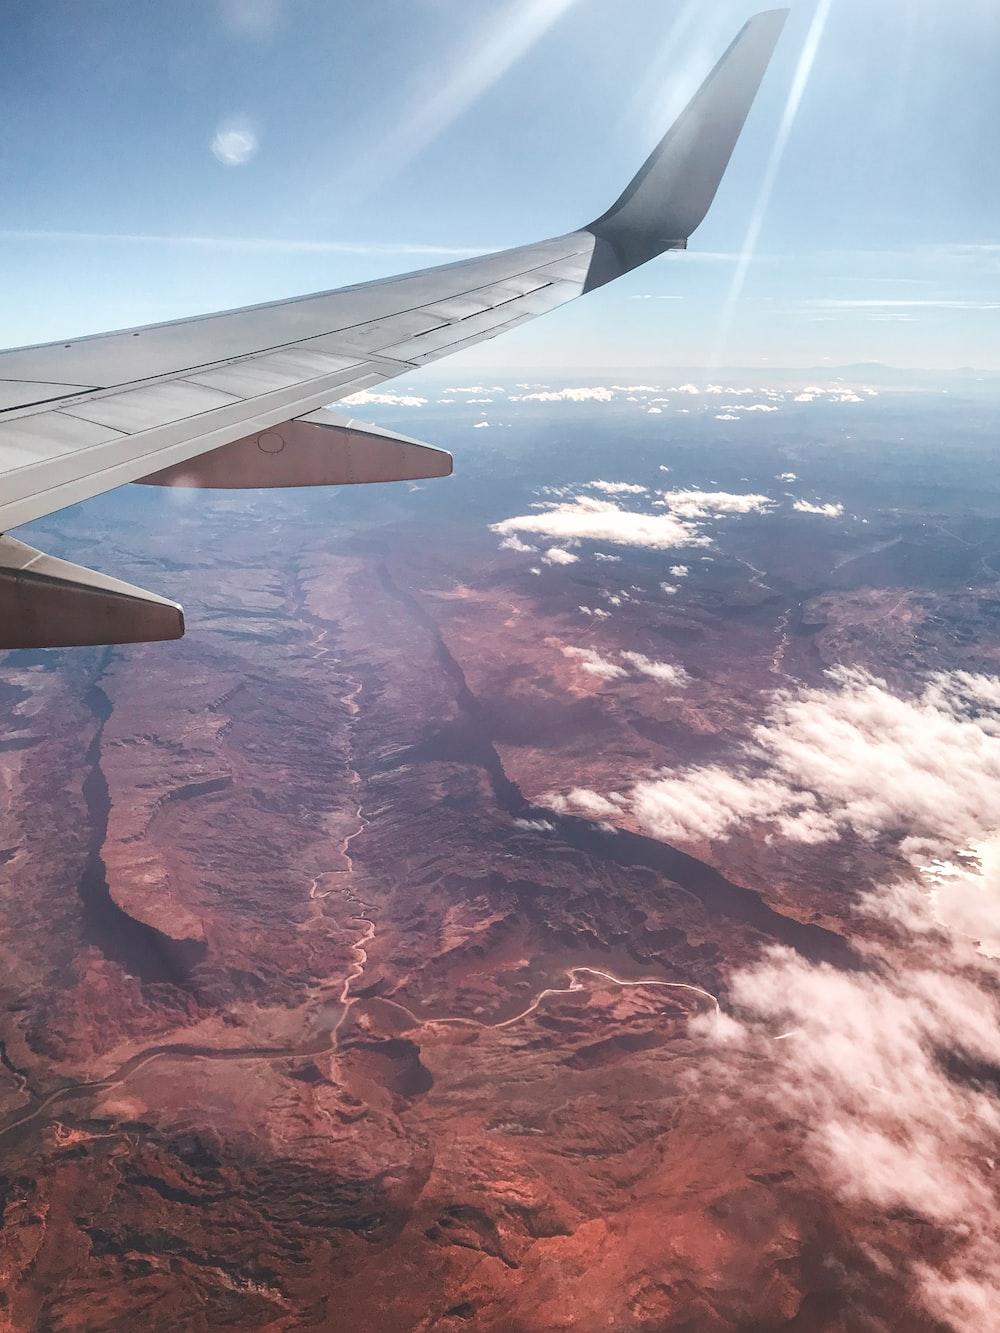 white airliner flying on sky during daytime